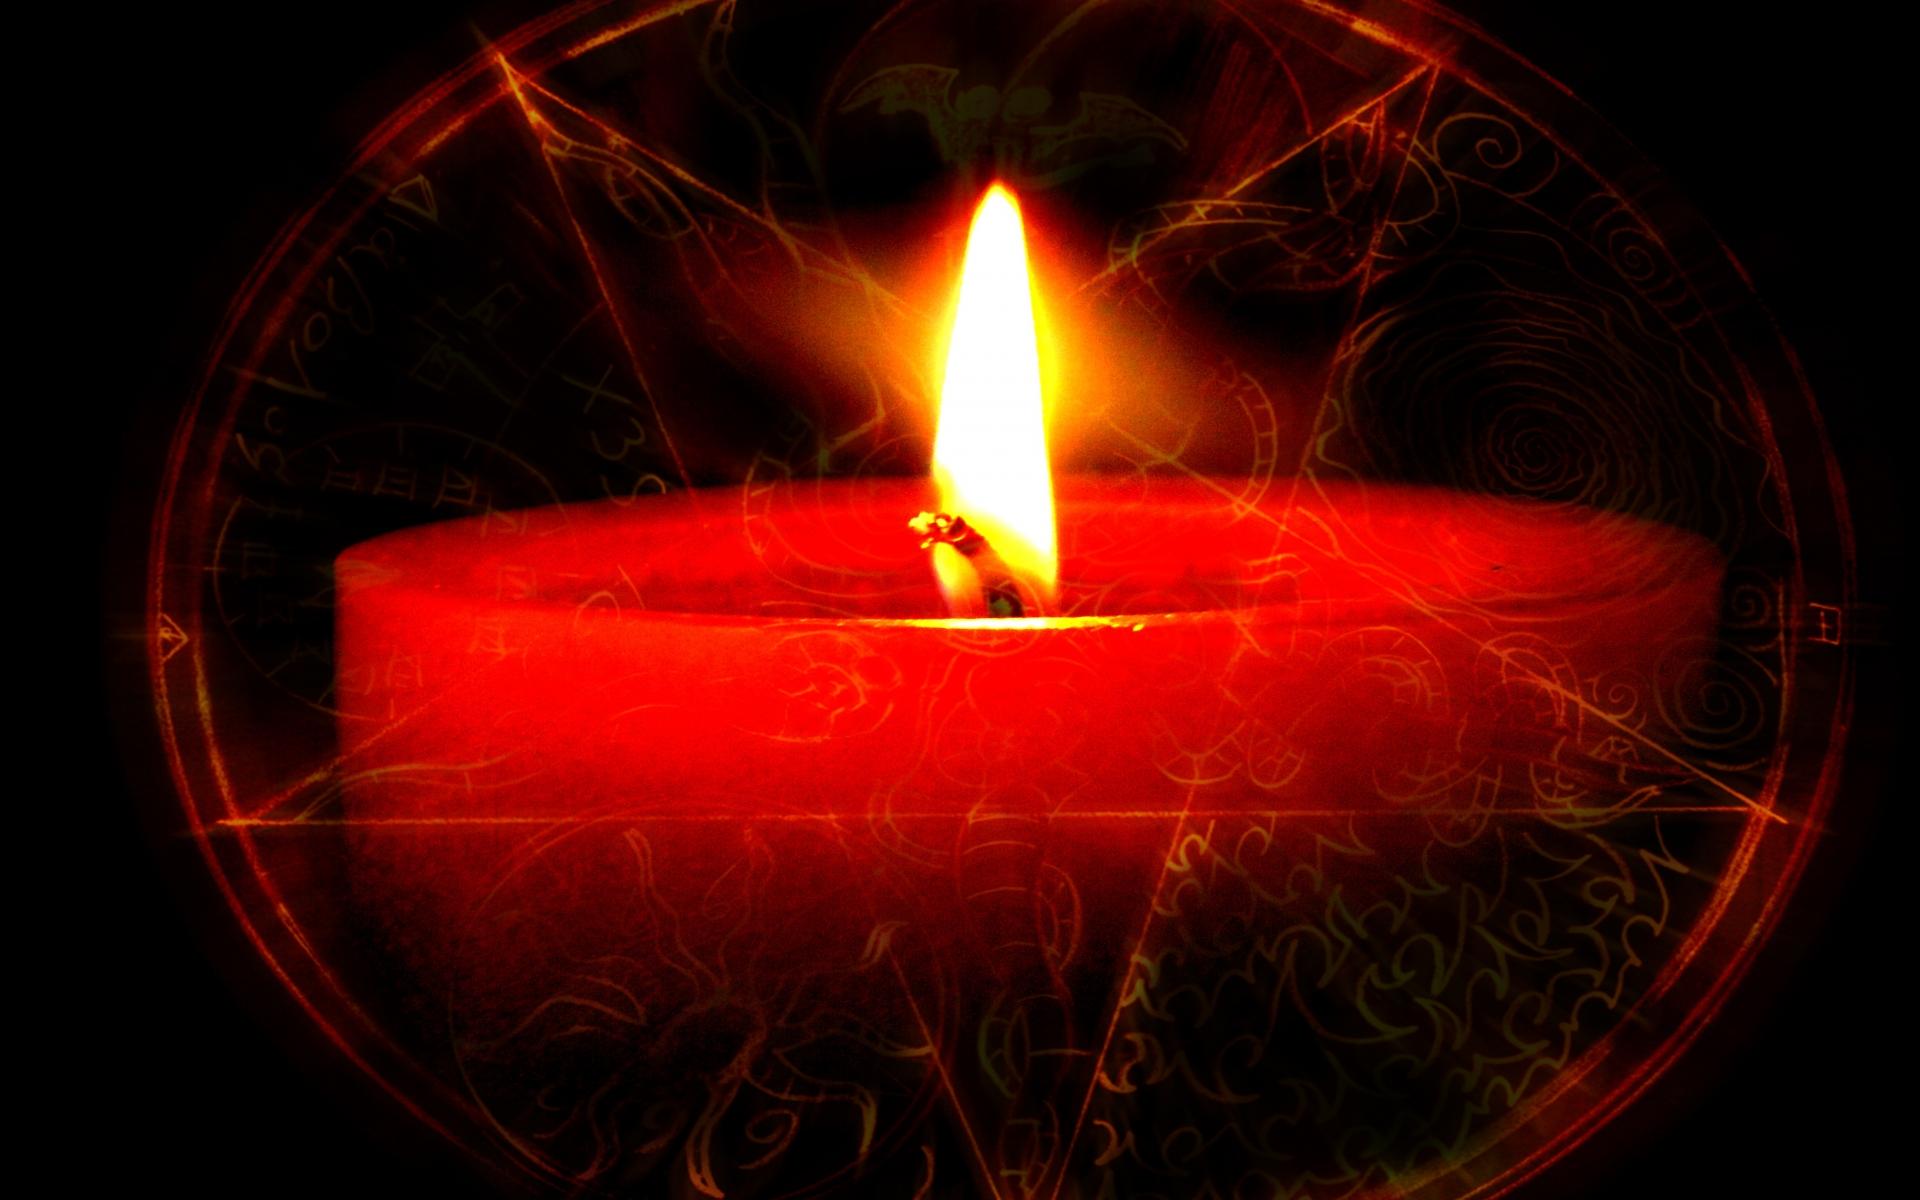 dark candles occult satan penta fire wallpaper background 1920x1200